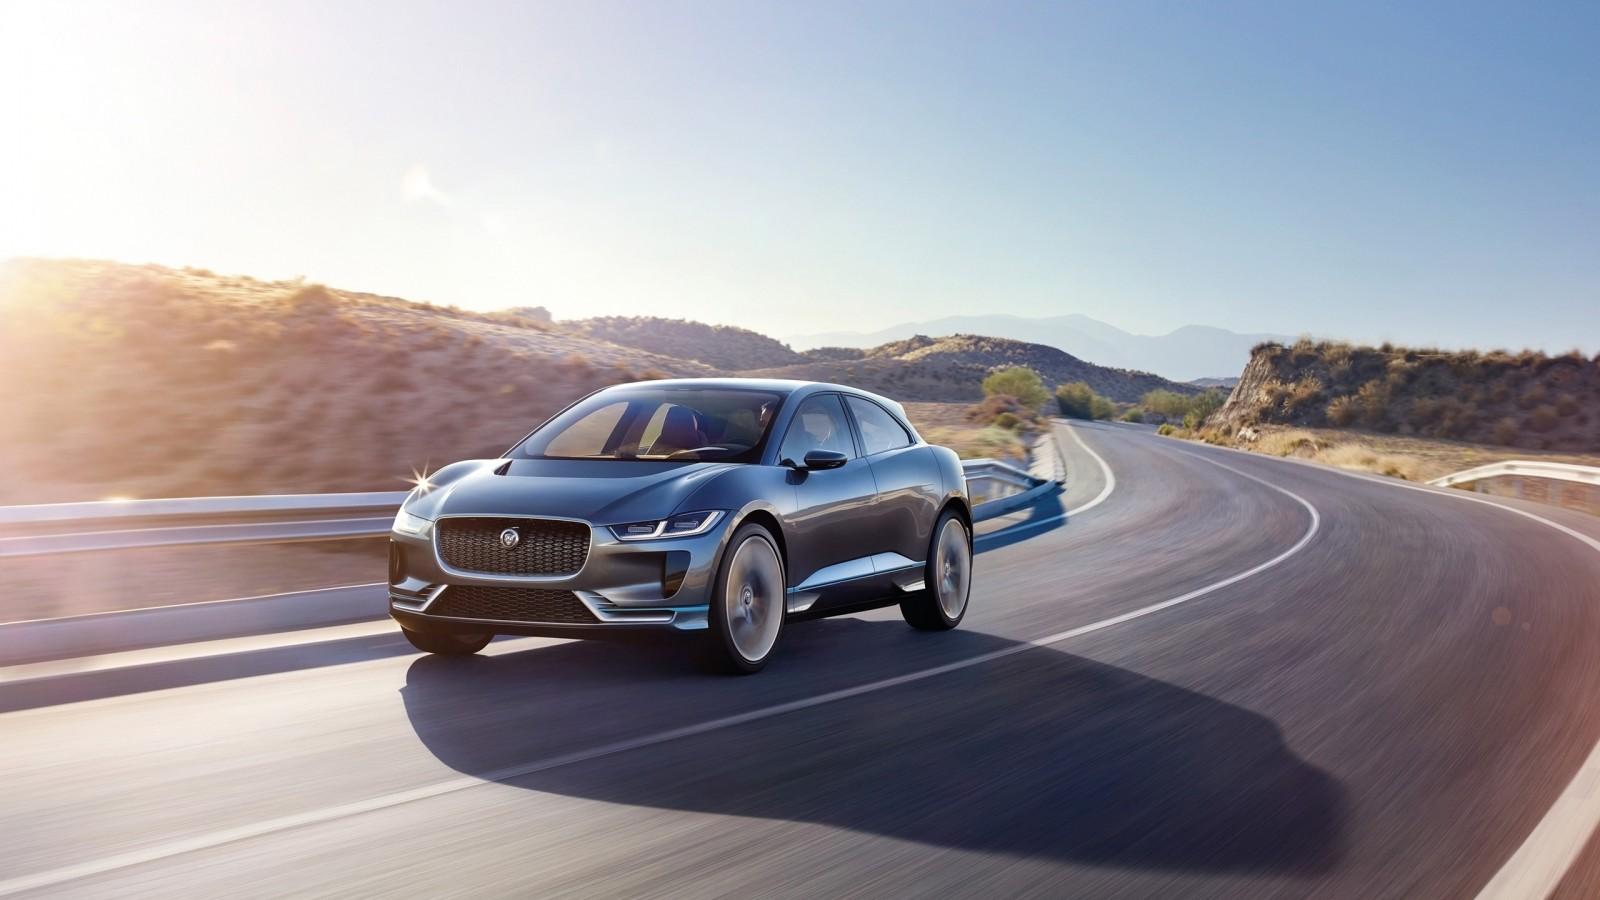 2018 Jaguar I Pace Concept Wallpaper